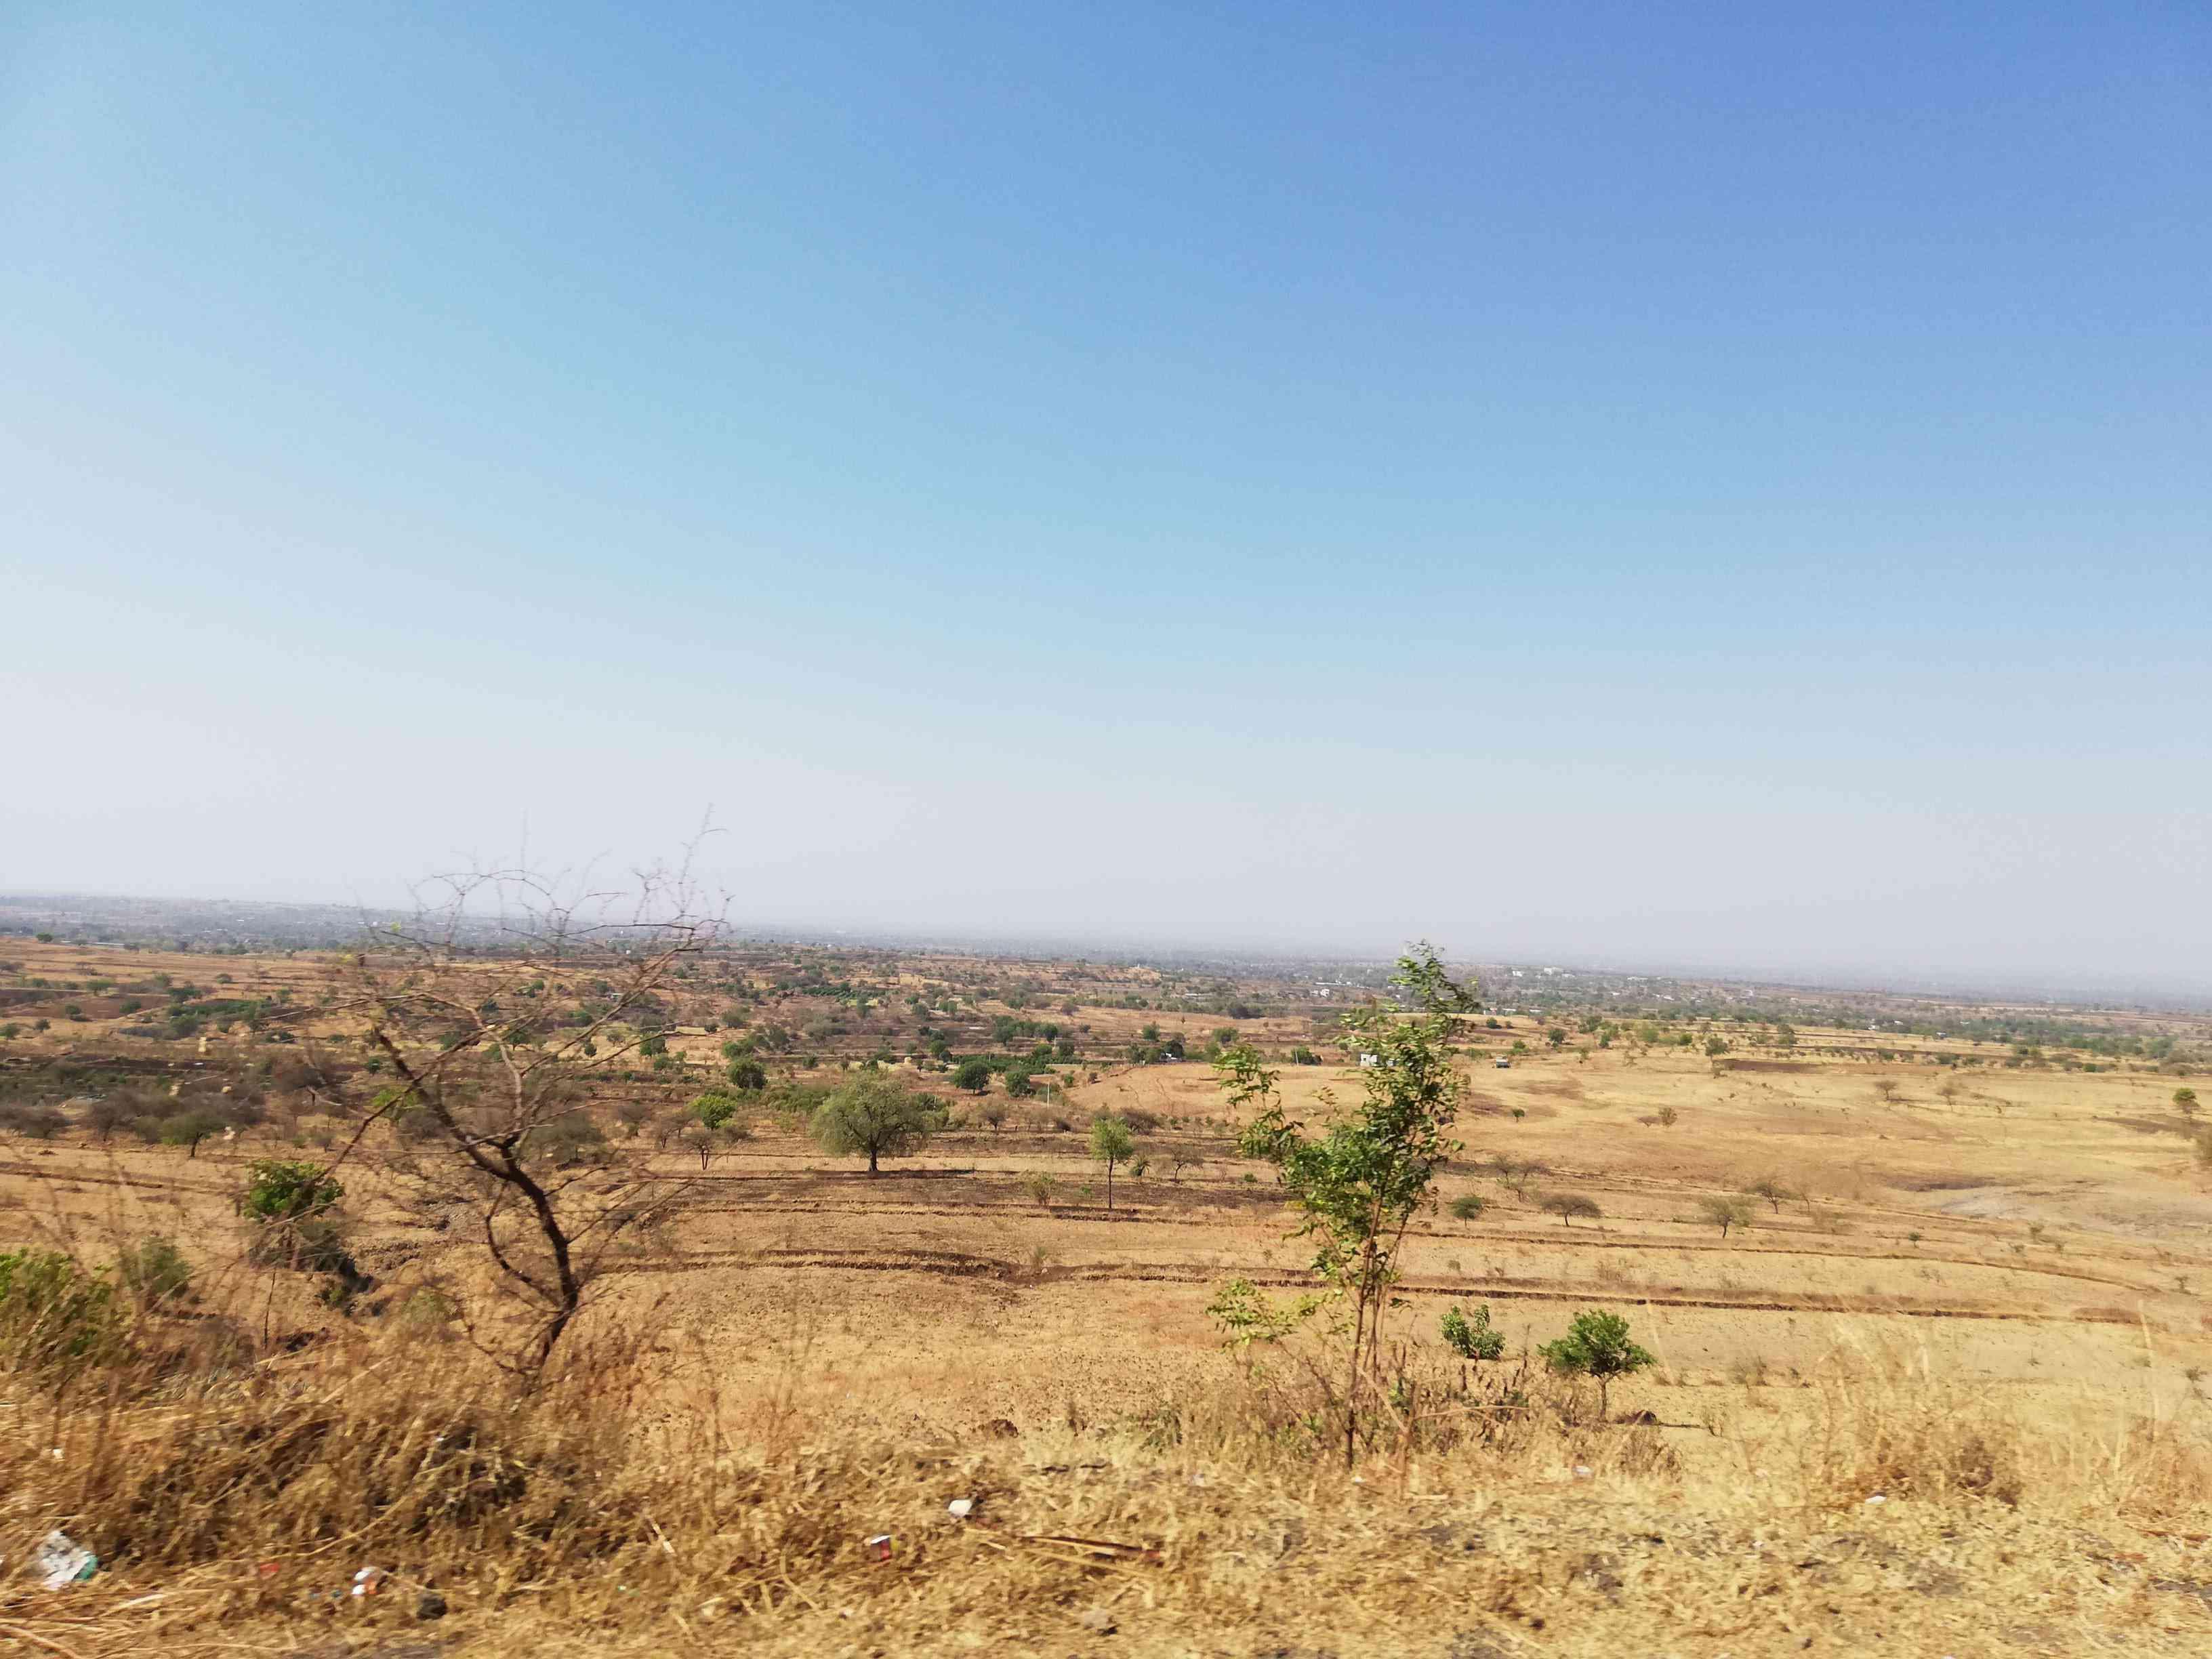 Ahmednagar is in the grip of a drought. (Photo credit: Mridula Chari).